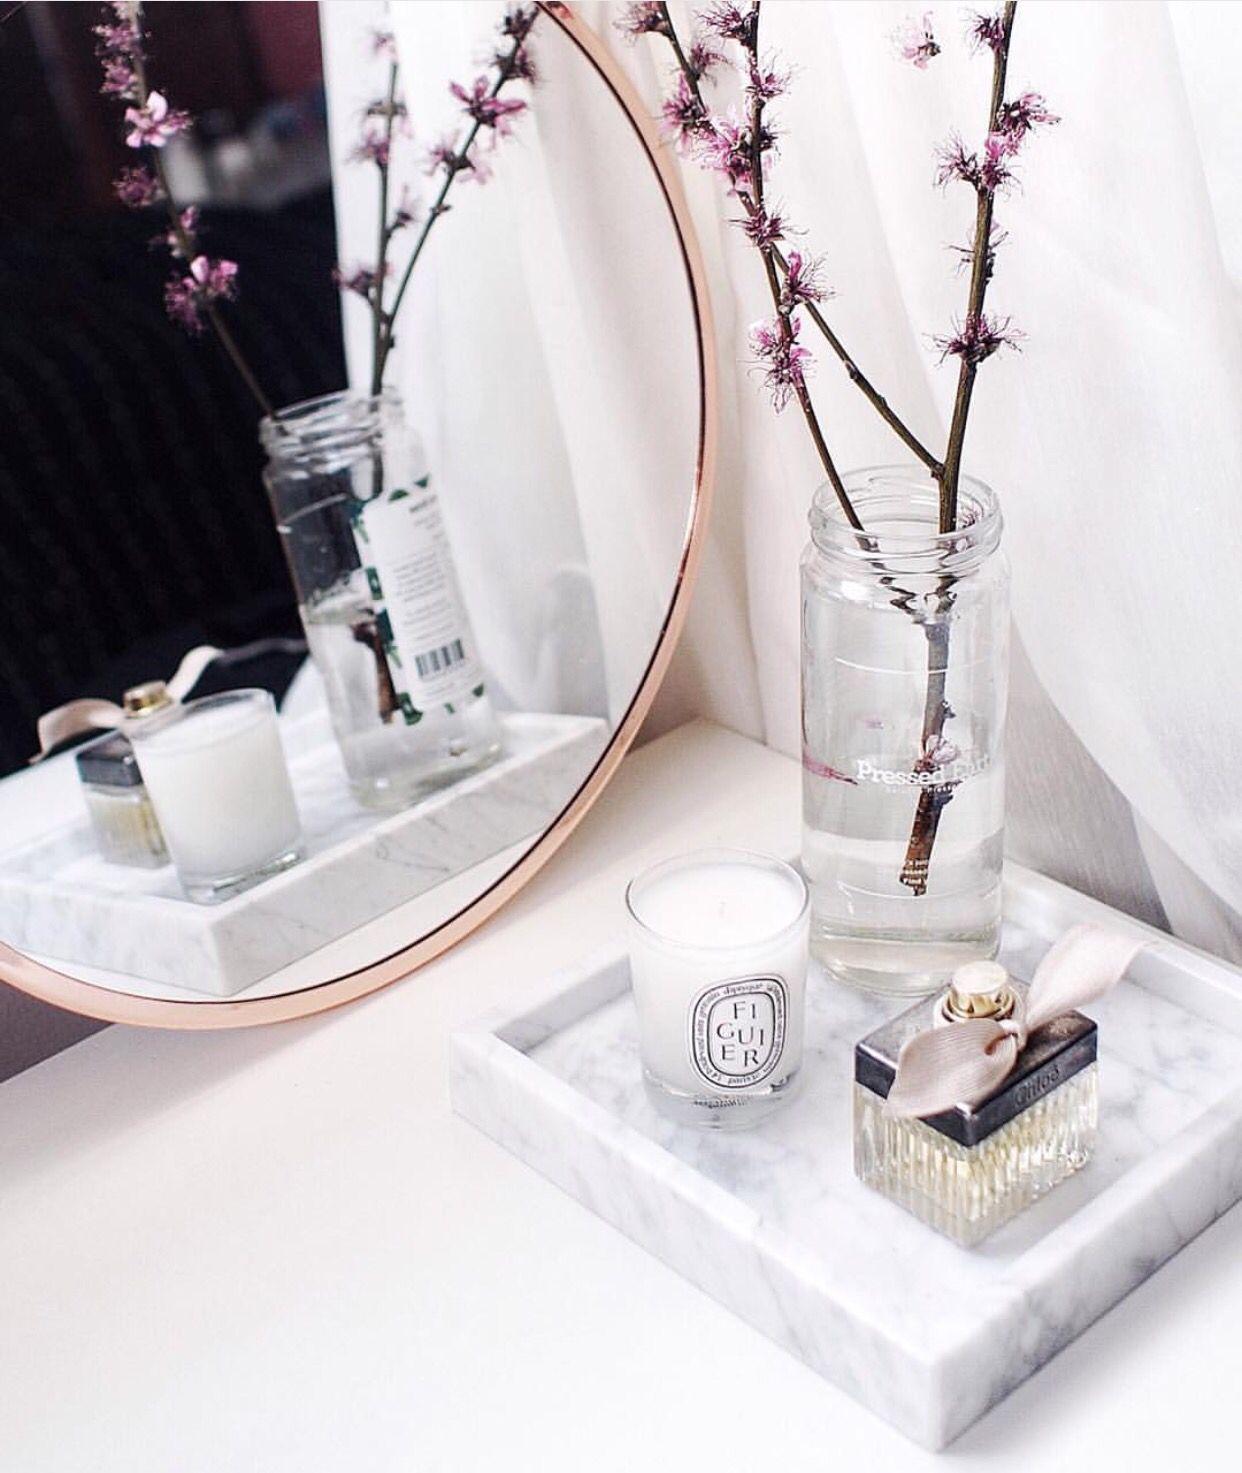 Dressing table ankleidezimmer einrichtungsideen for Marmortisch modern